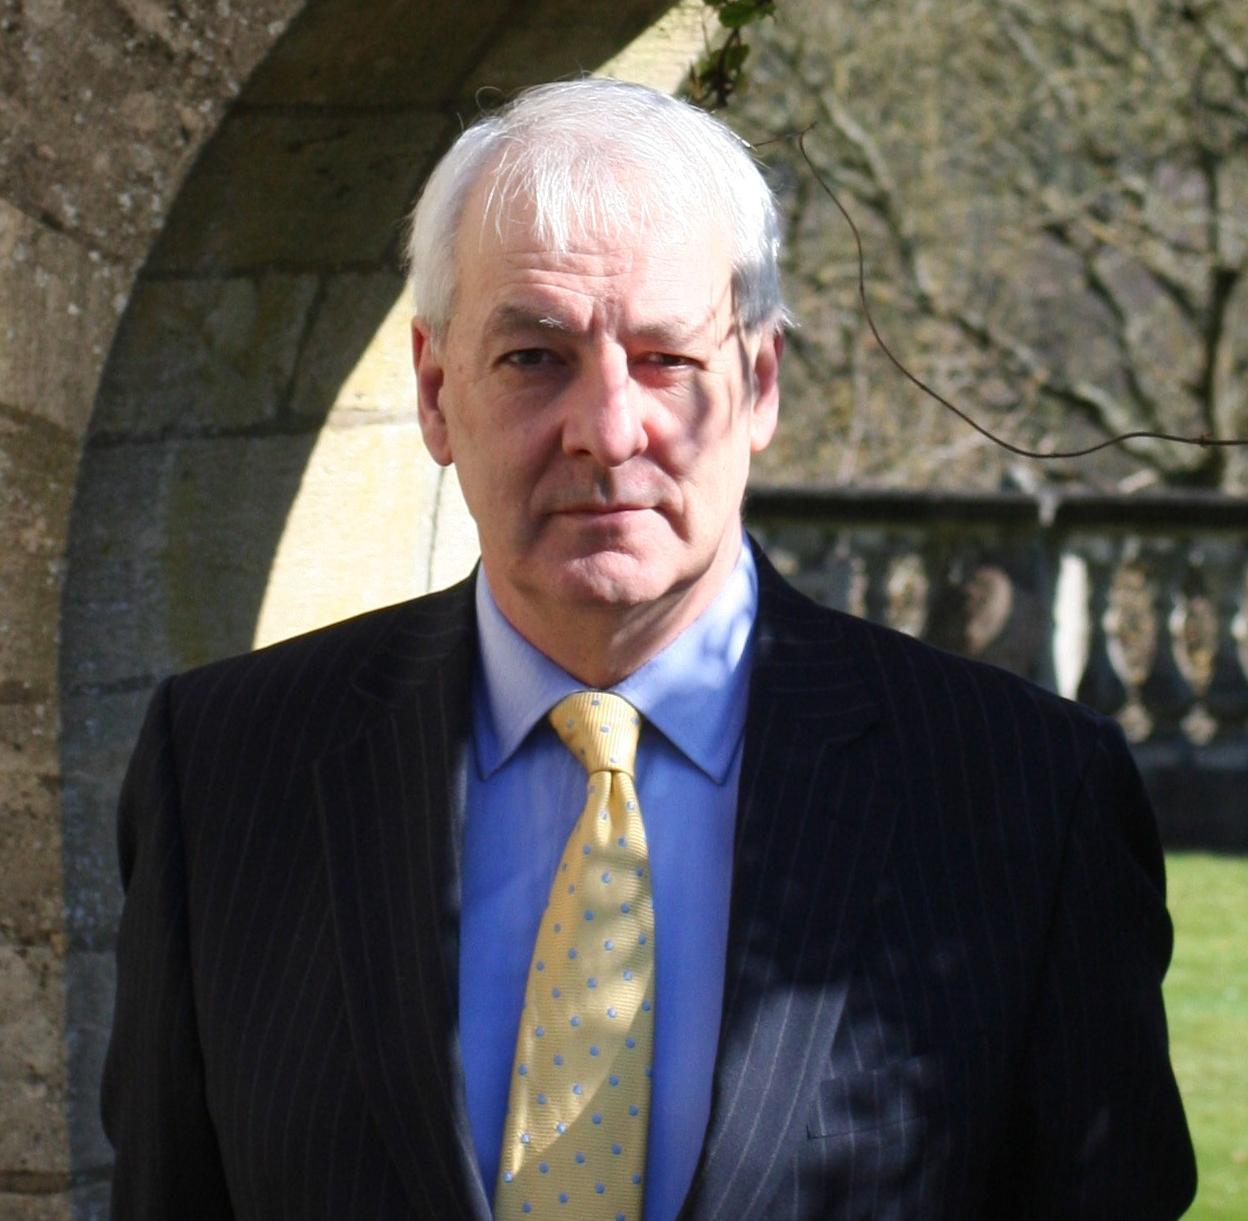 James Hill, Senior Partner at Alanbrookes